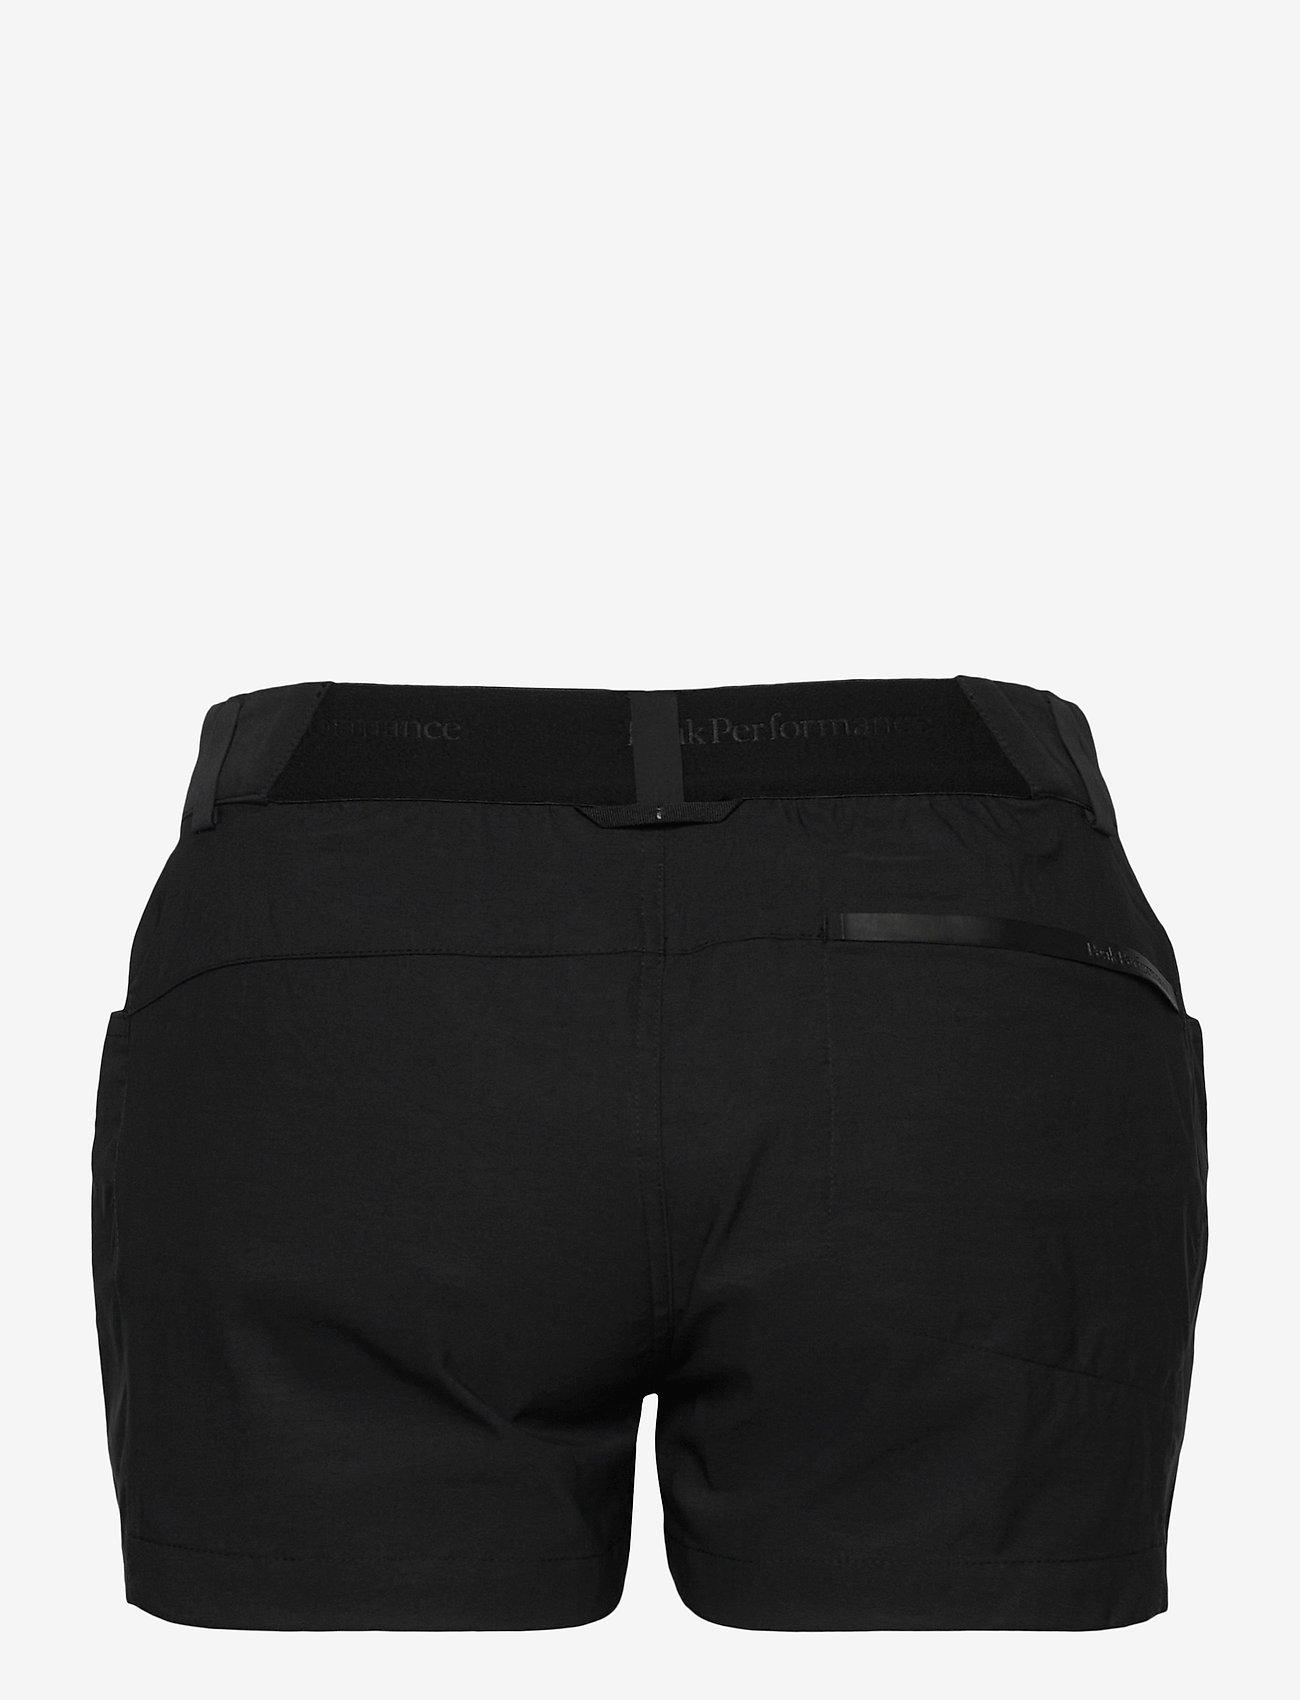 Peak Performance - W Iconiq Shorts - wandel korte broek - black - 1